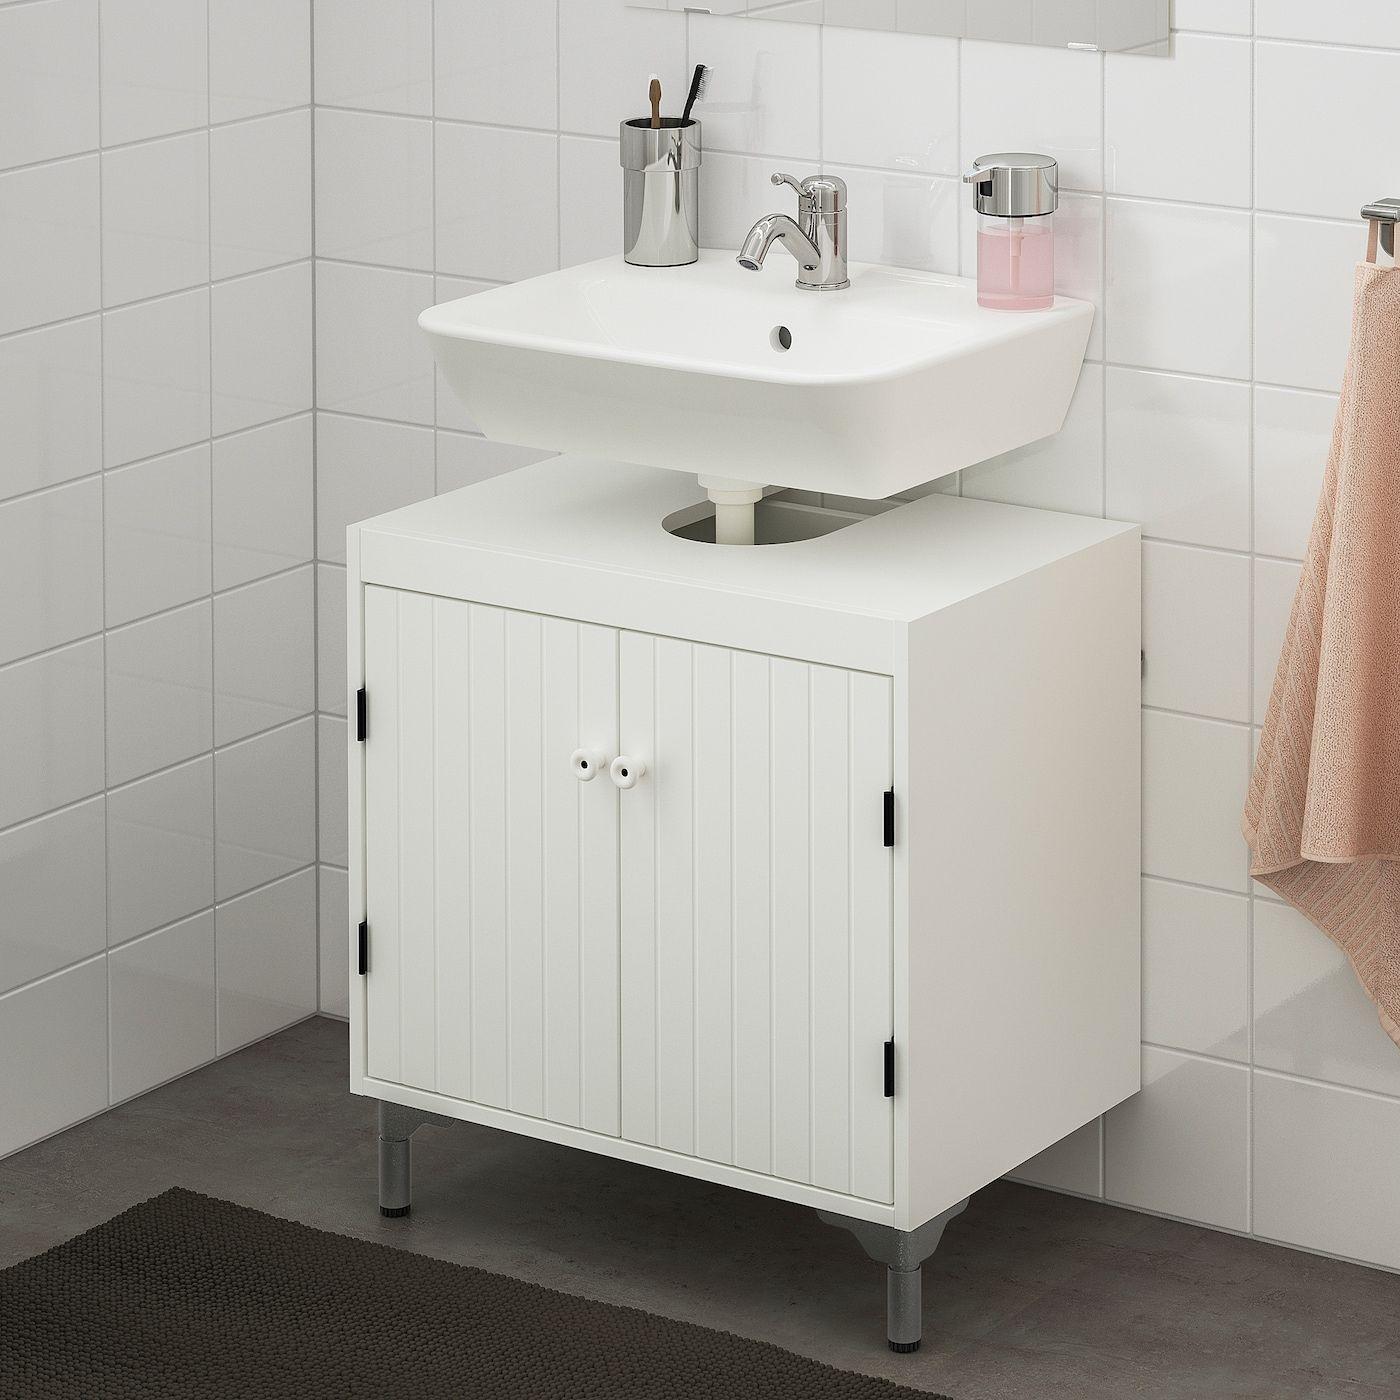 Ikea Silver Aring N Tyngen Waschbeckenunterschrank 2 T Uuml Ren Wei Szlig Lillsvan Mischbatterie In 2020 Waschbeckenunterschrank Unterschrank Mischbatterien